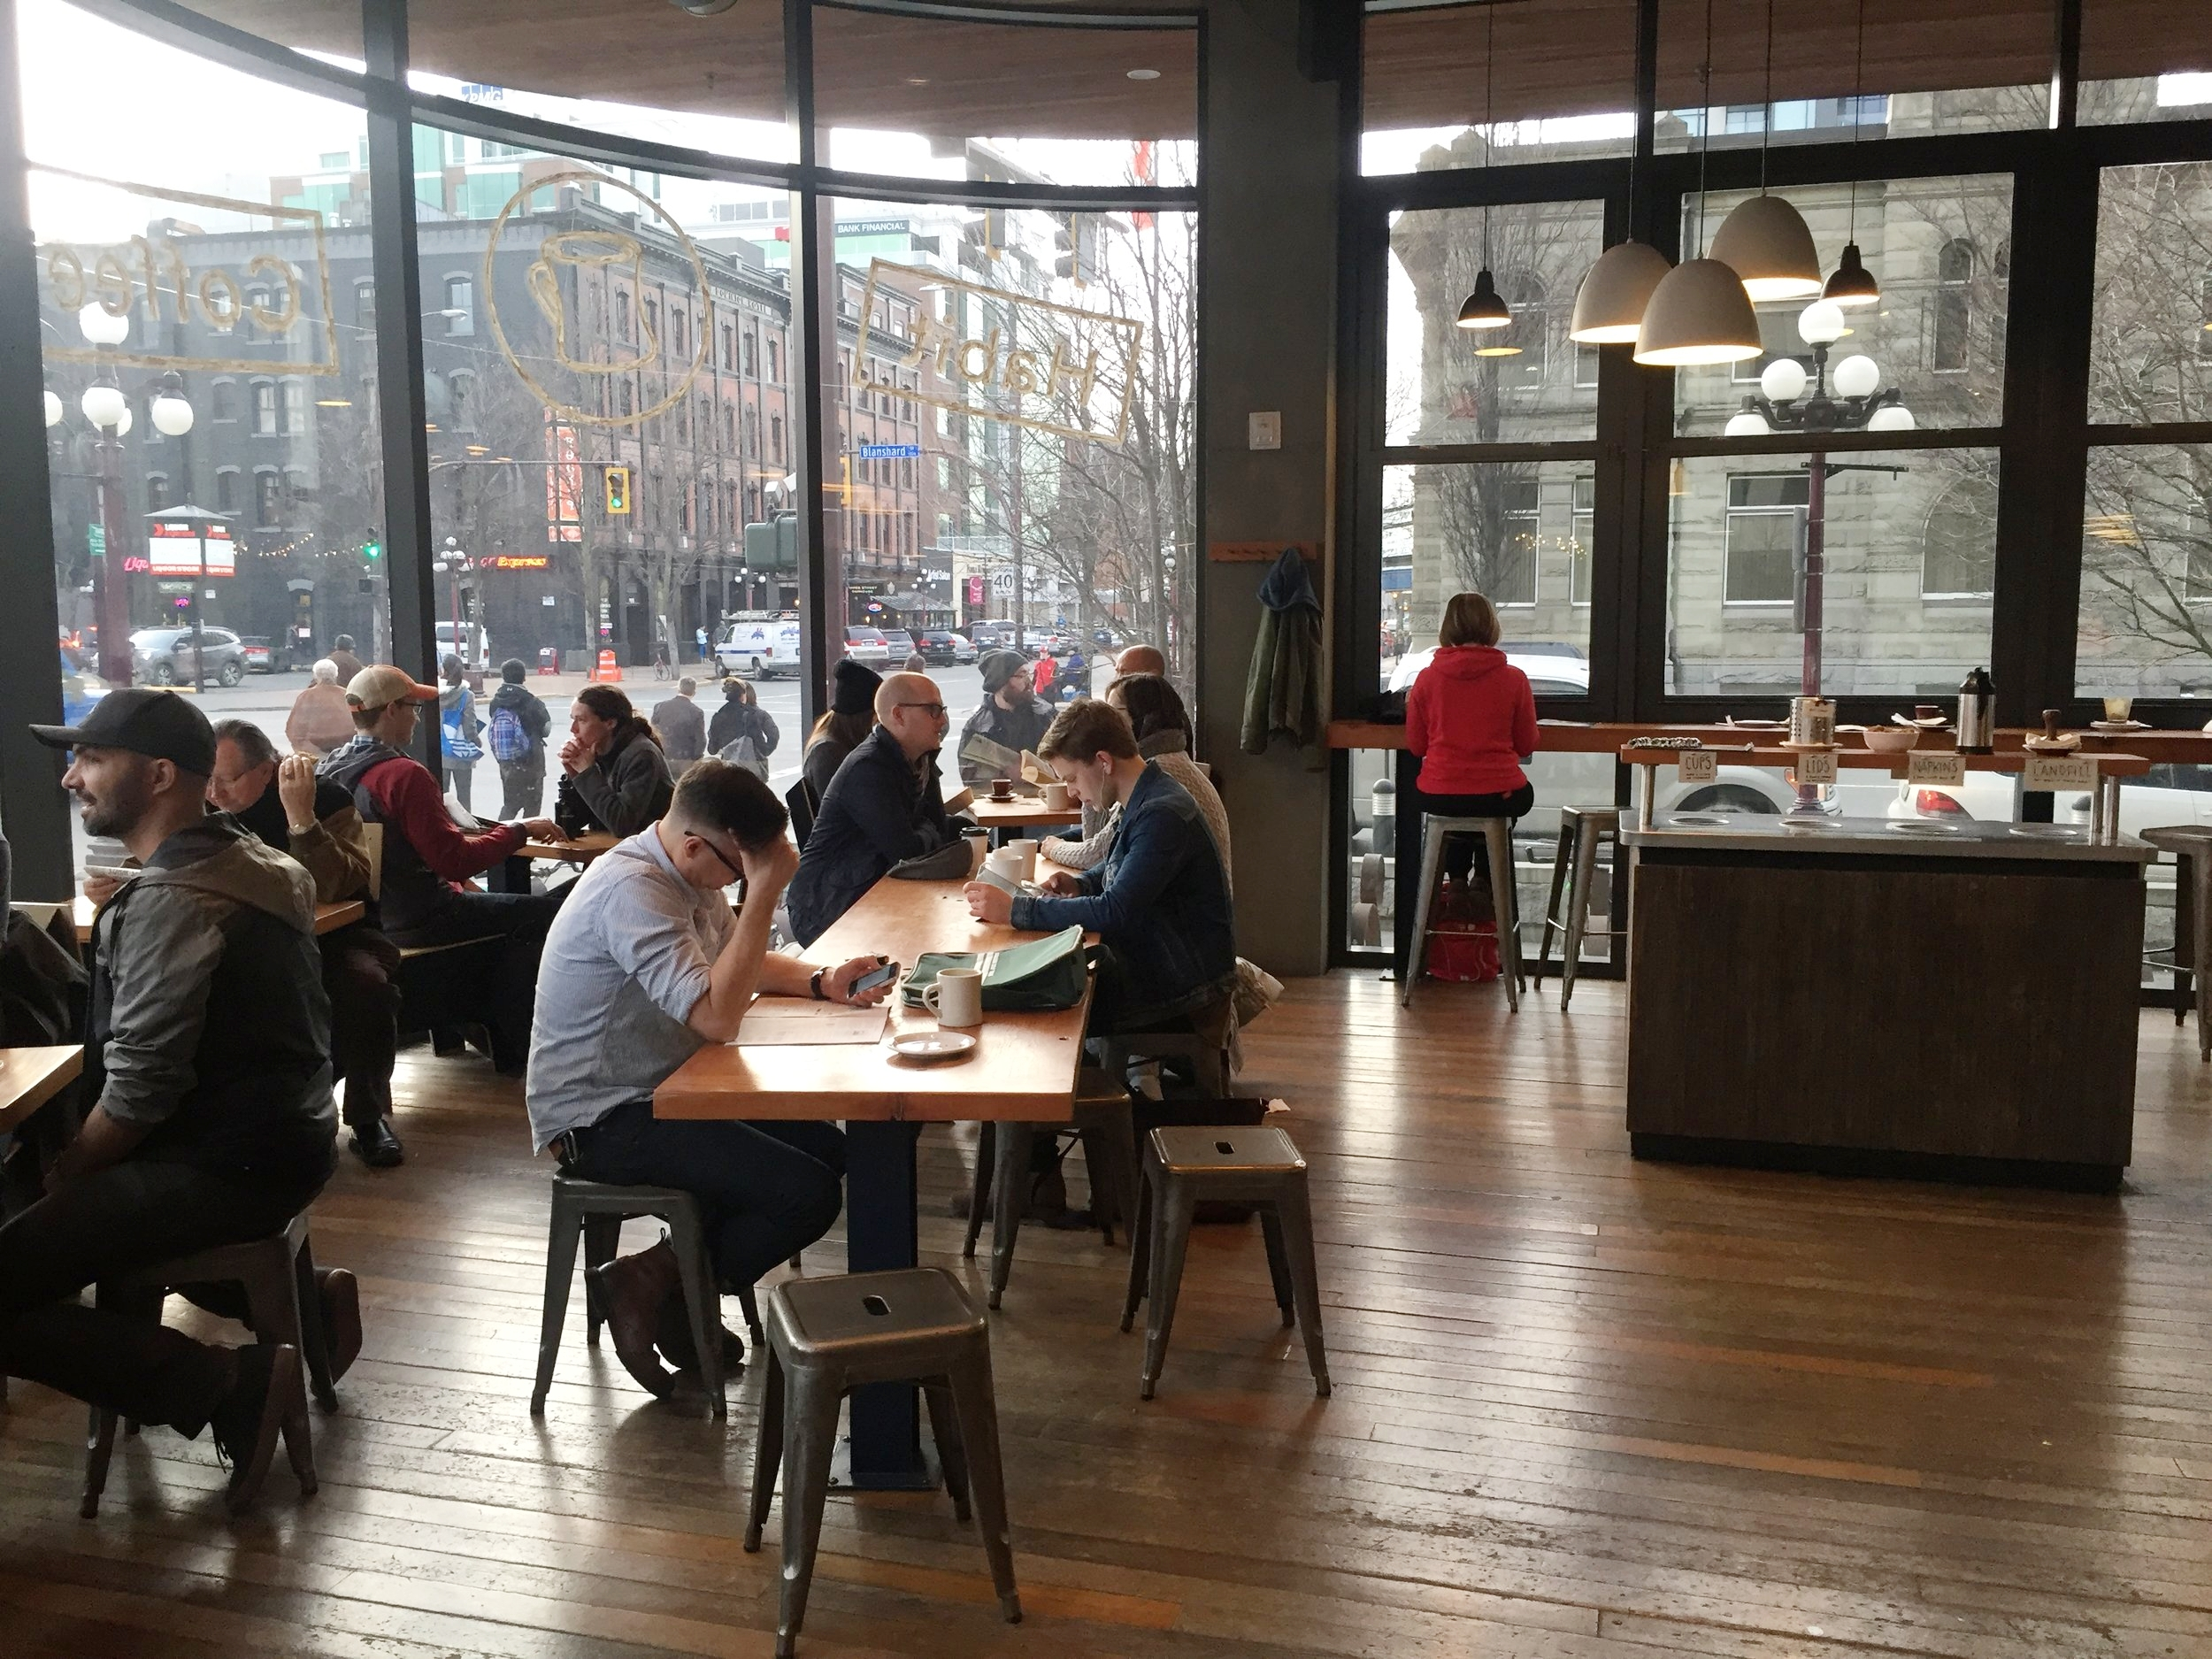 Coffee Shops 3 - Habit Coffee.JPG